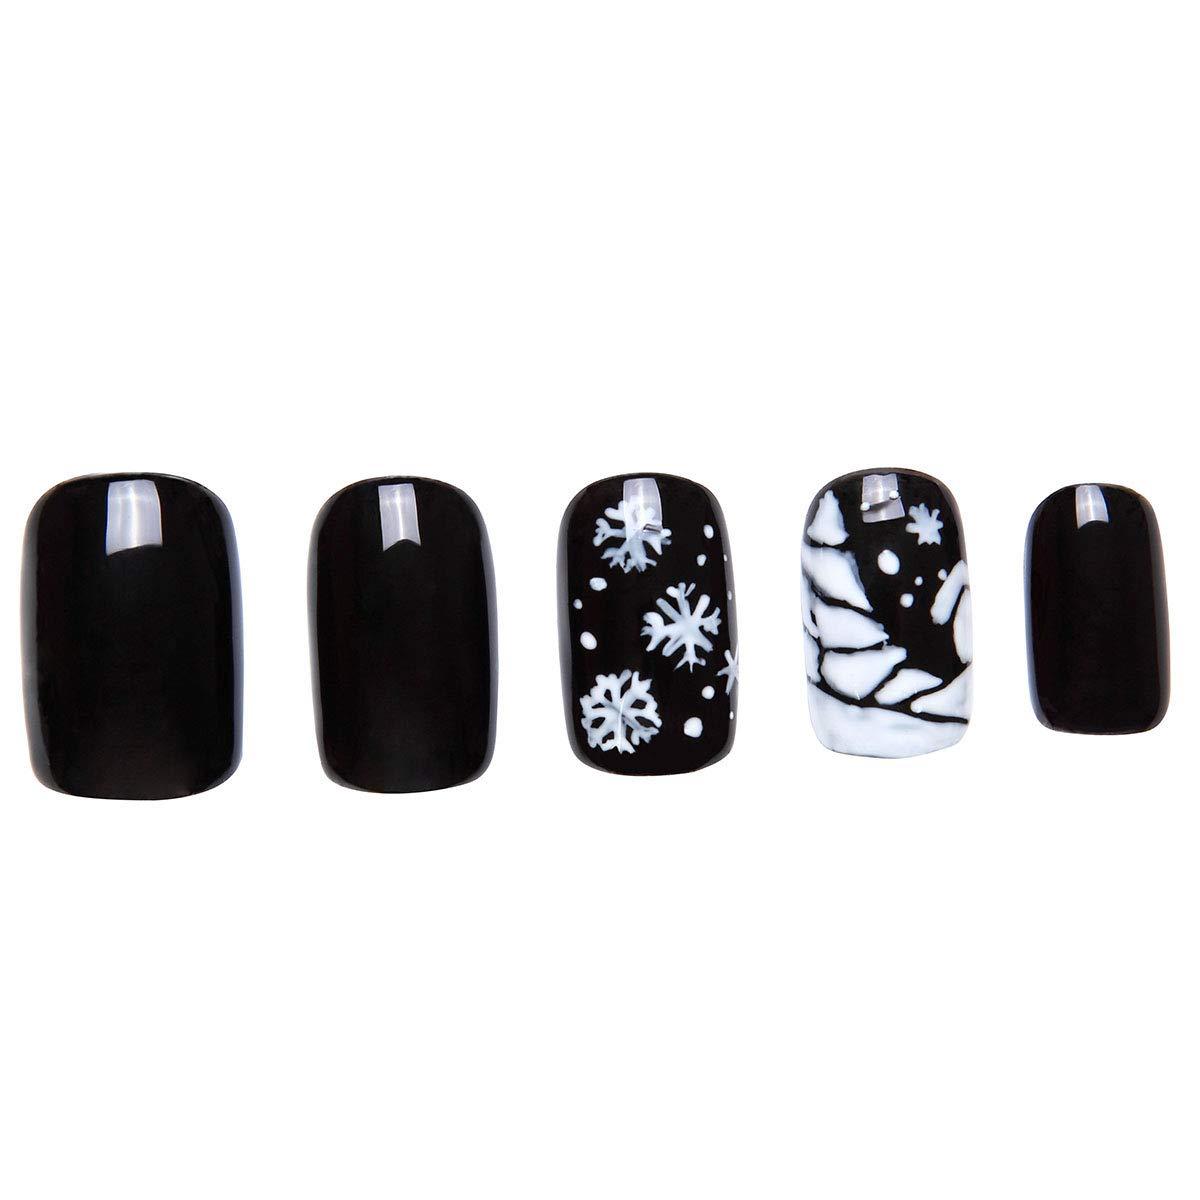 Amazon.com : 24 Pcs of 12 Different Sizes Handmade Navidad Tranquila Finger Fake Nail for Christmas : Beauty